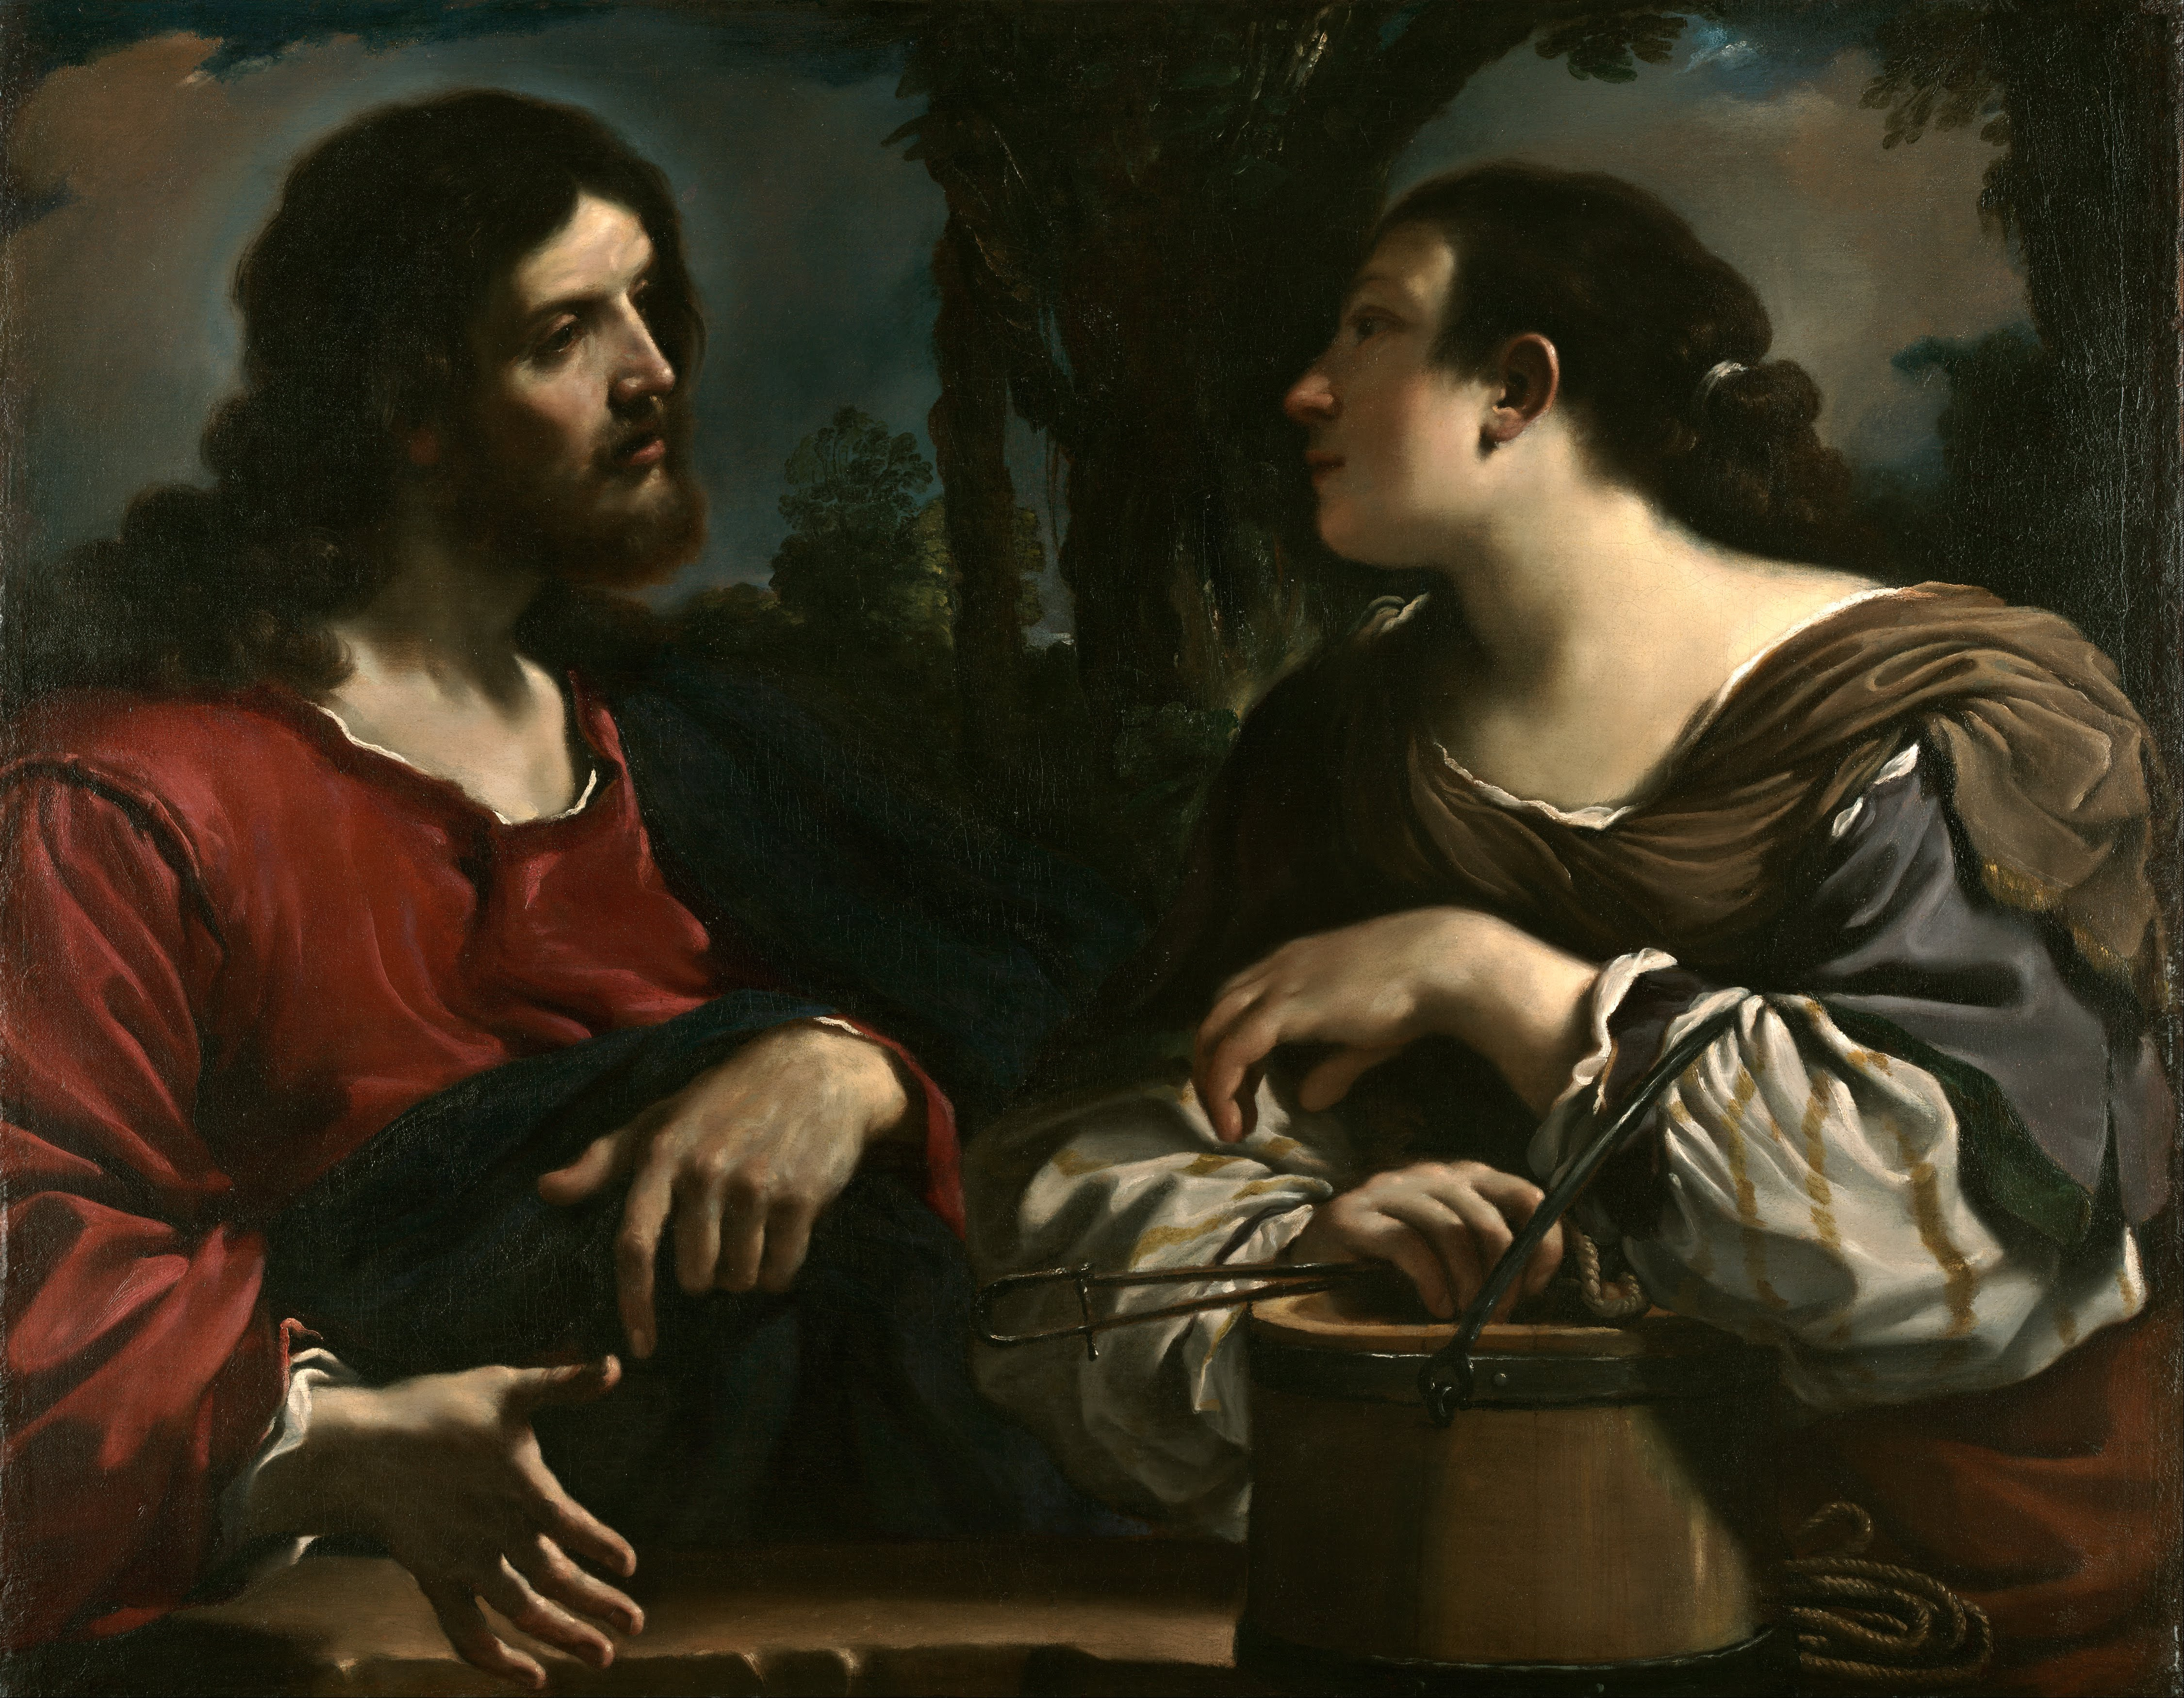 https://upload.wikimedia.org/wikipedia/commons/2/24/Guercino_%28Giovanni_Francesco_Barbieri%29_-_Christ_and_the_Woman_of_Samaria_-_Google_Art_Project.jpg